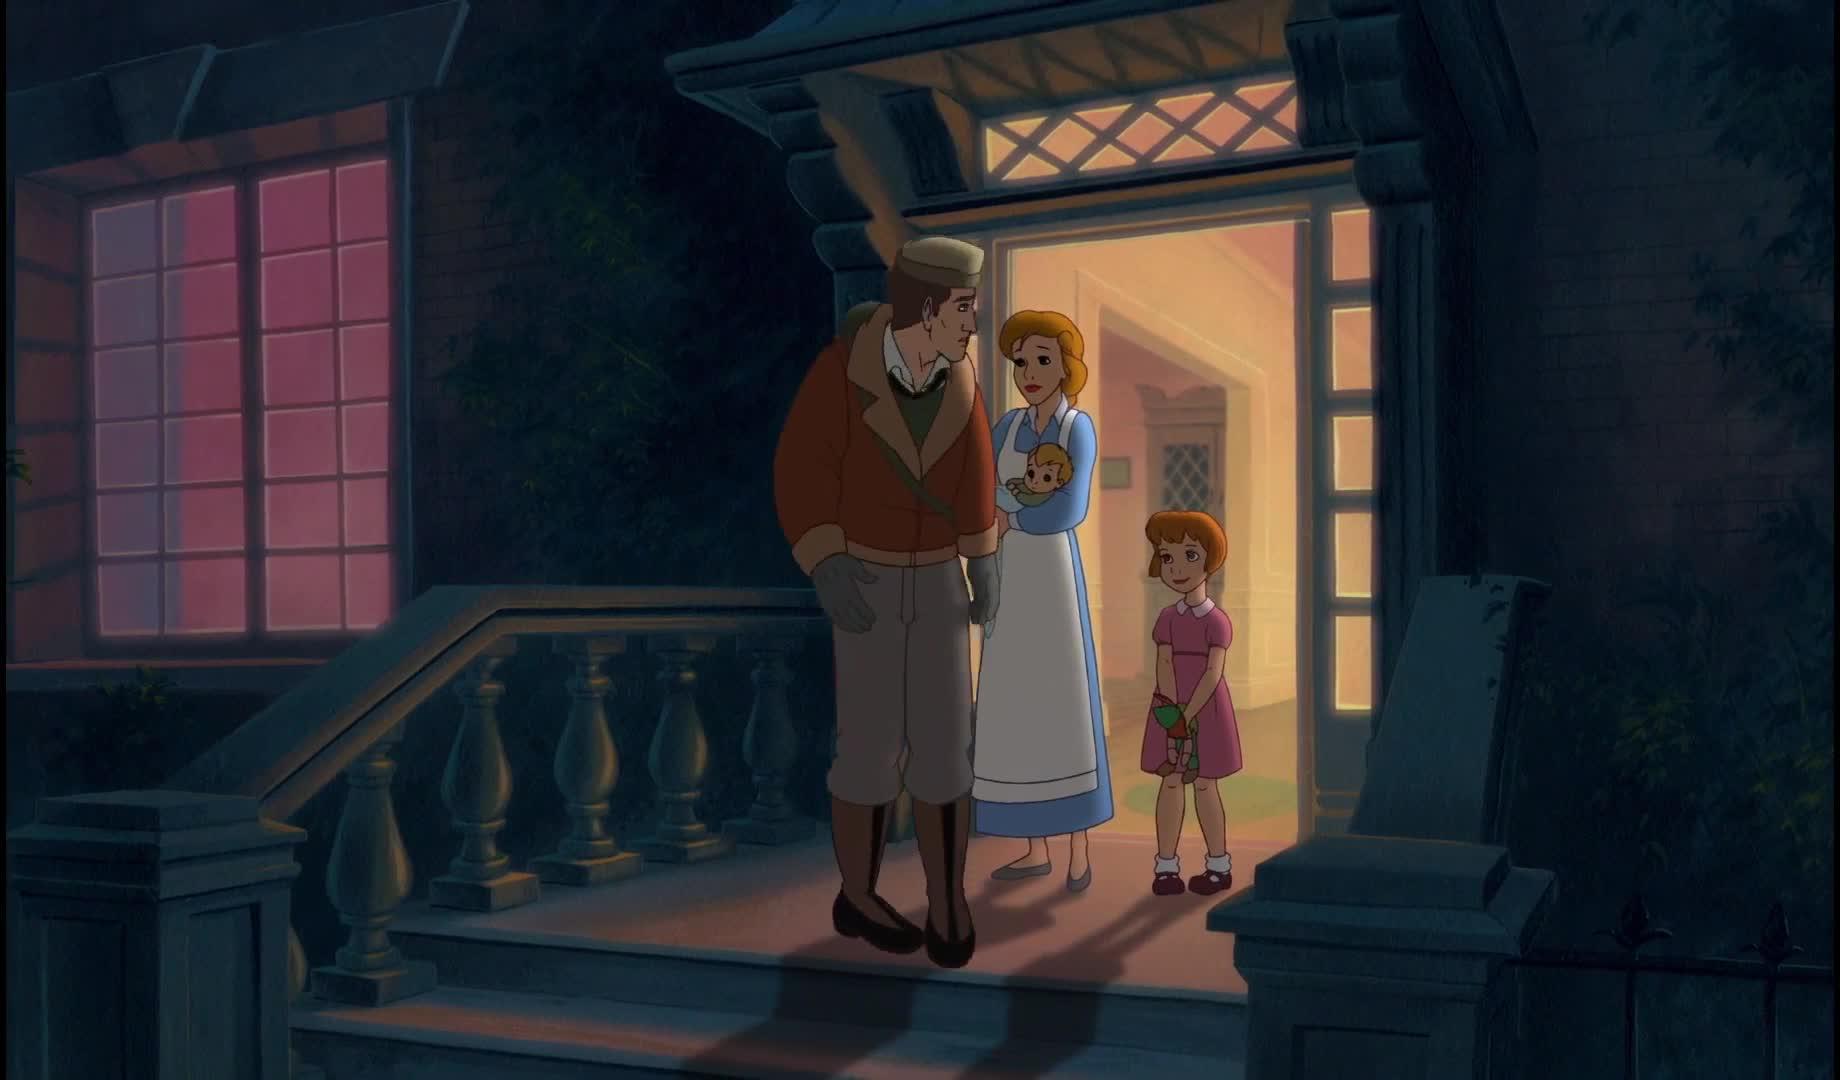 Peter Pan   Navrat do zeme nezeme 2002 CZ dab